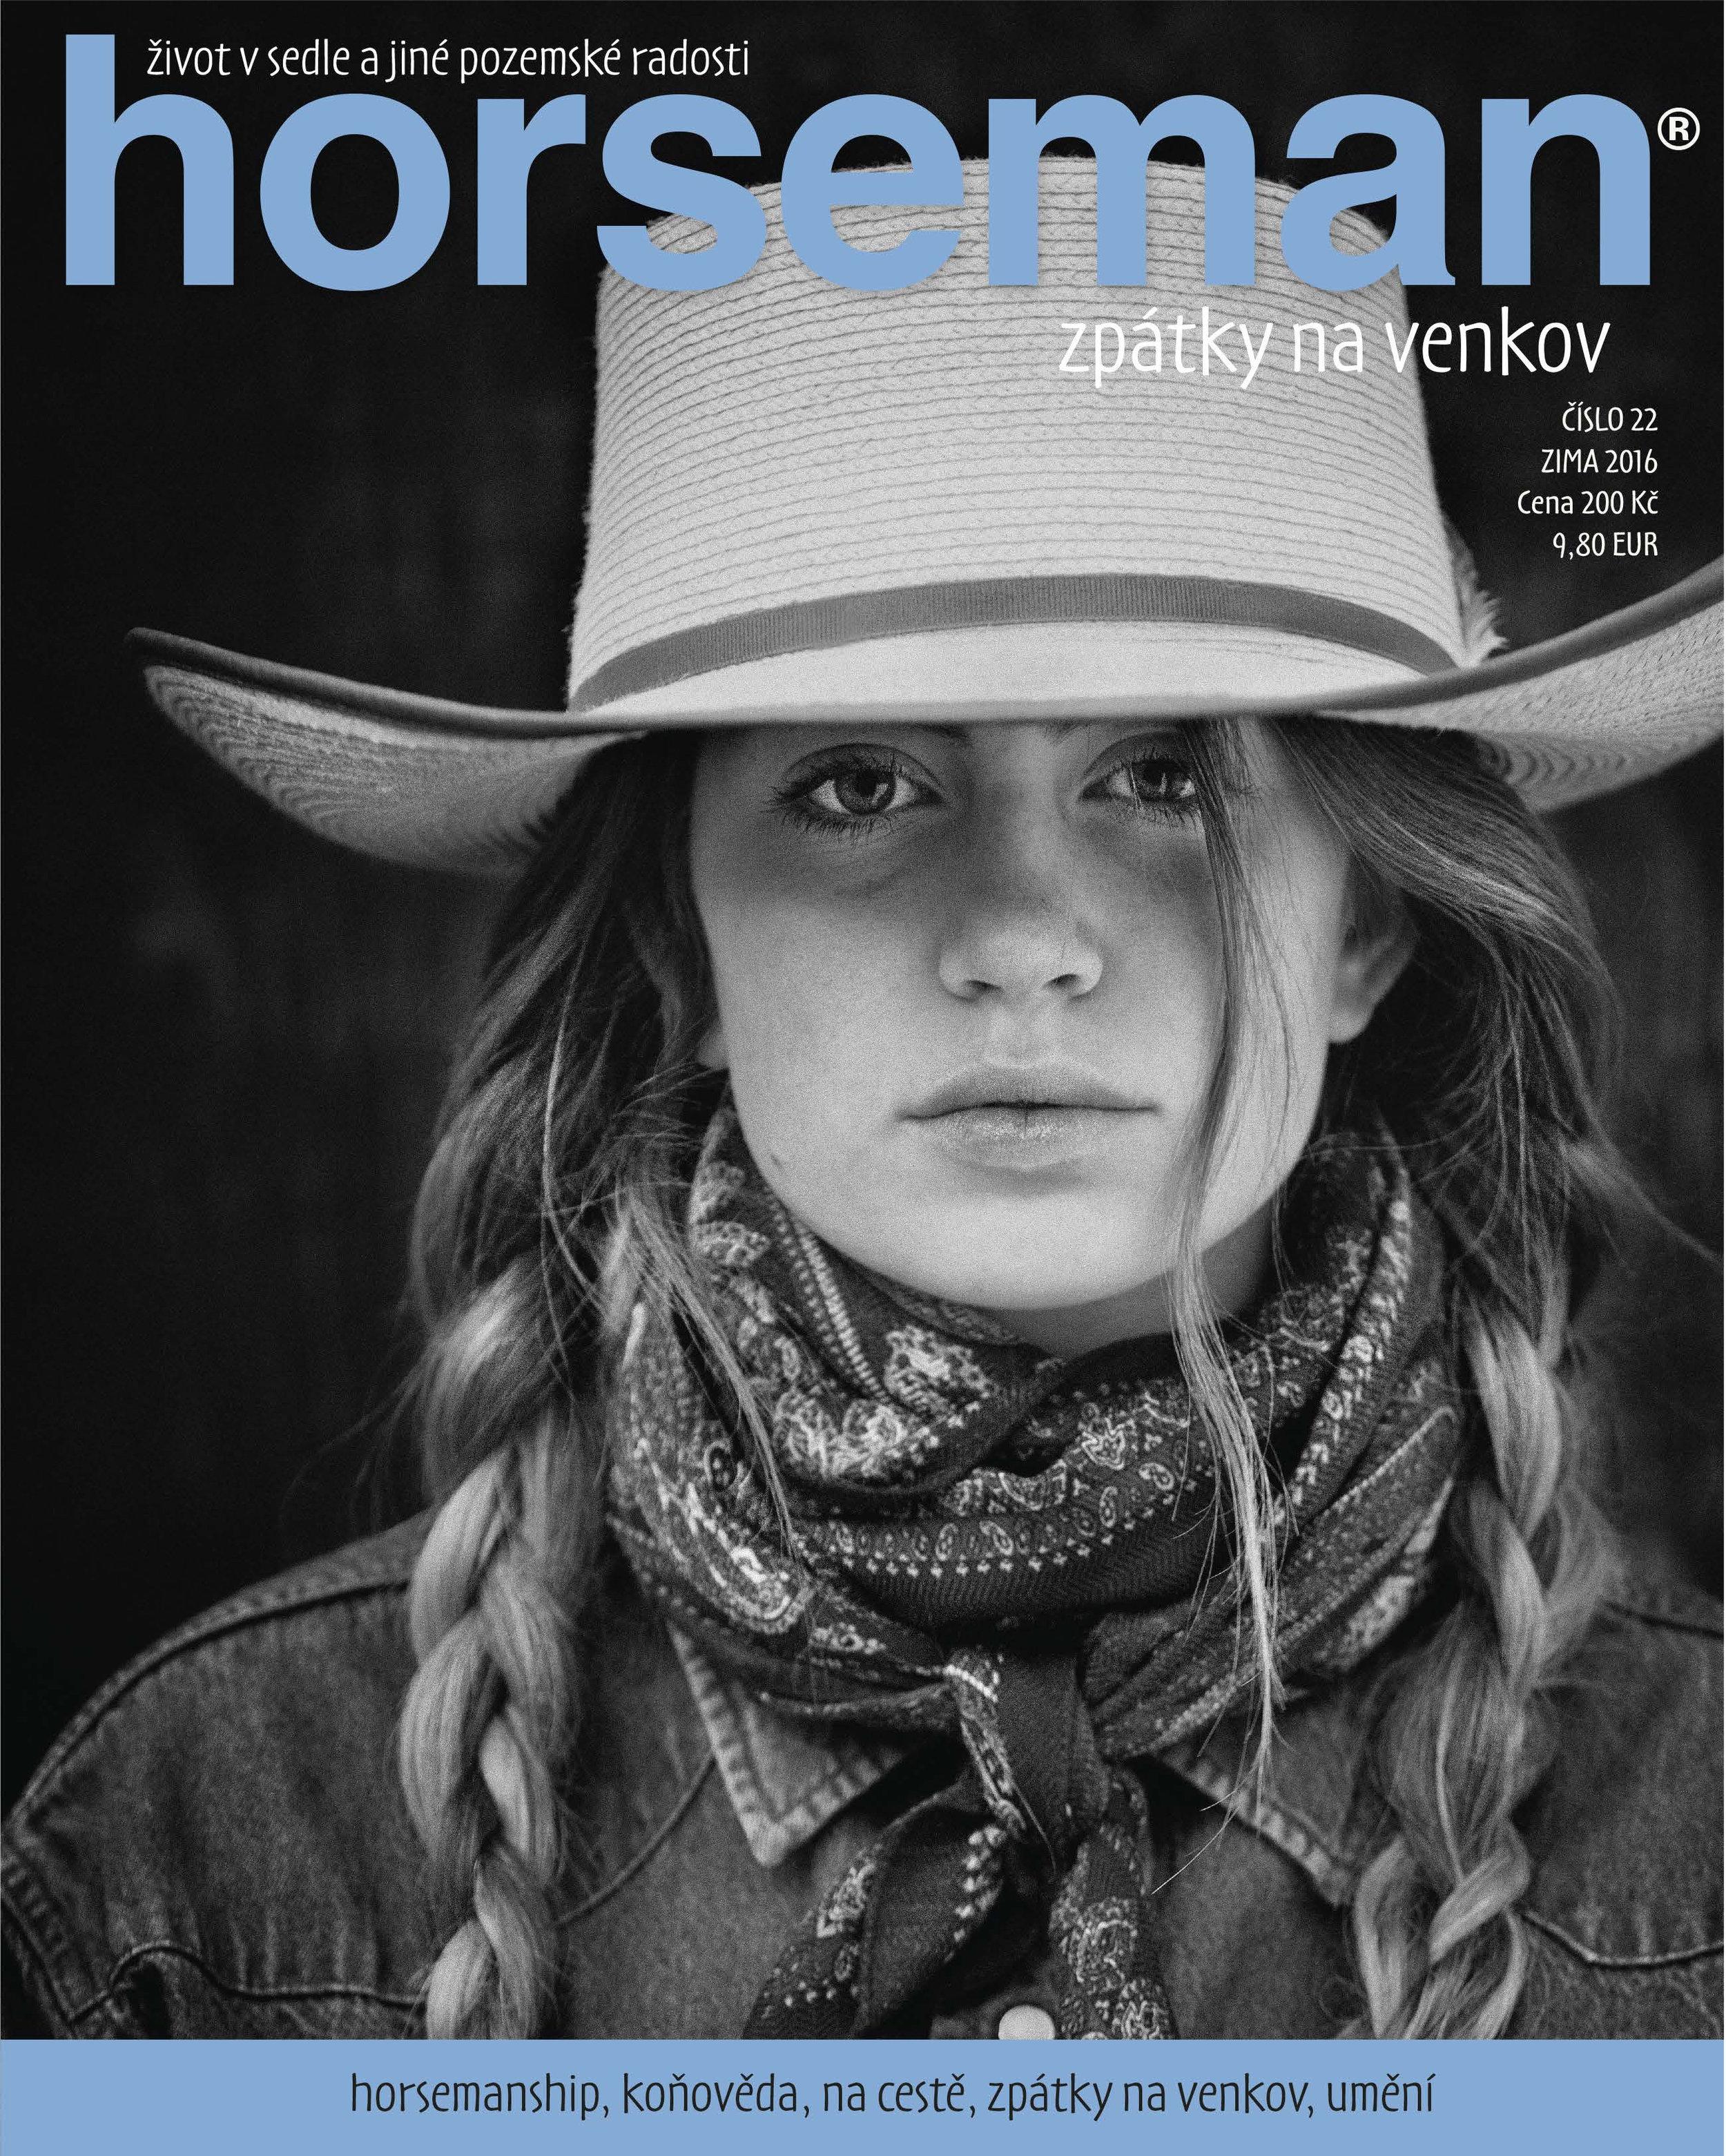 Horseman - Scott copy 2.jpg